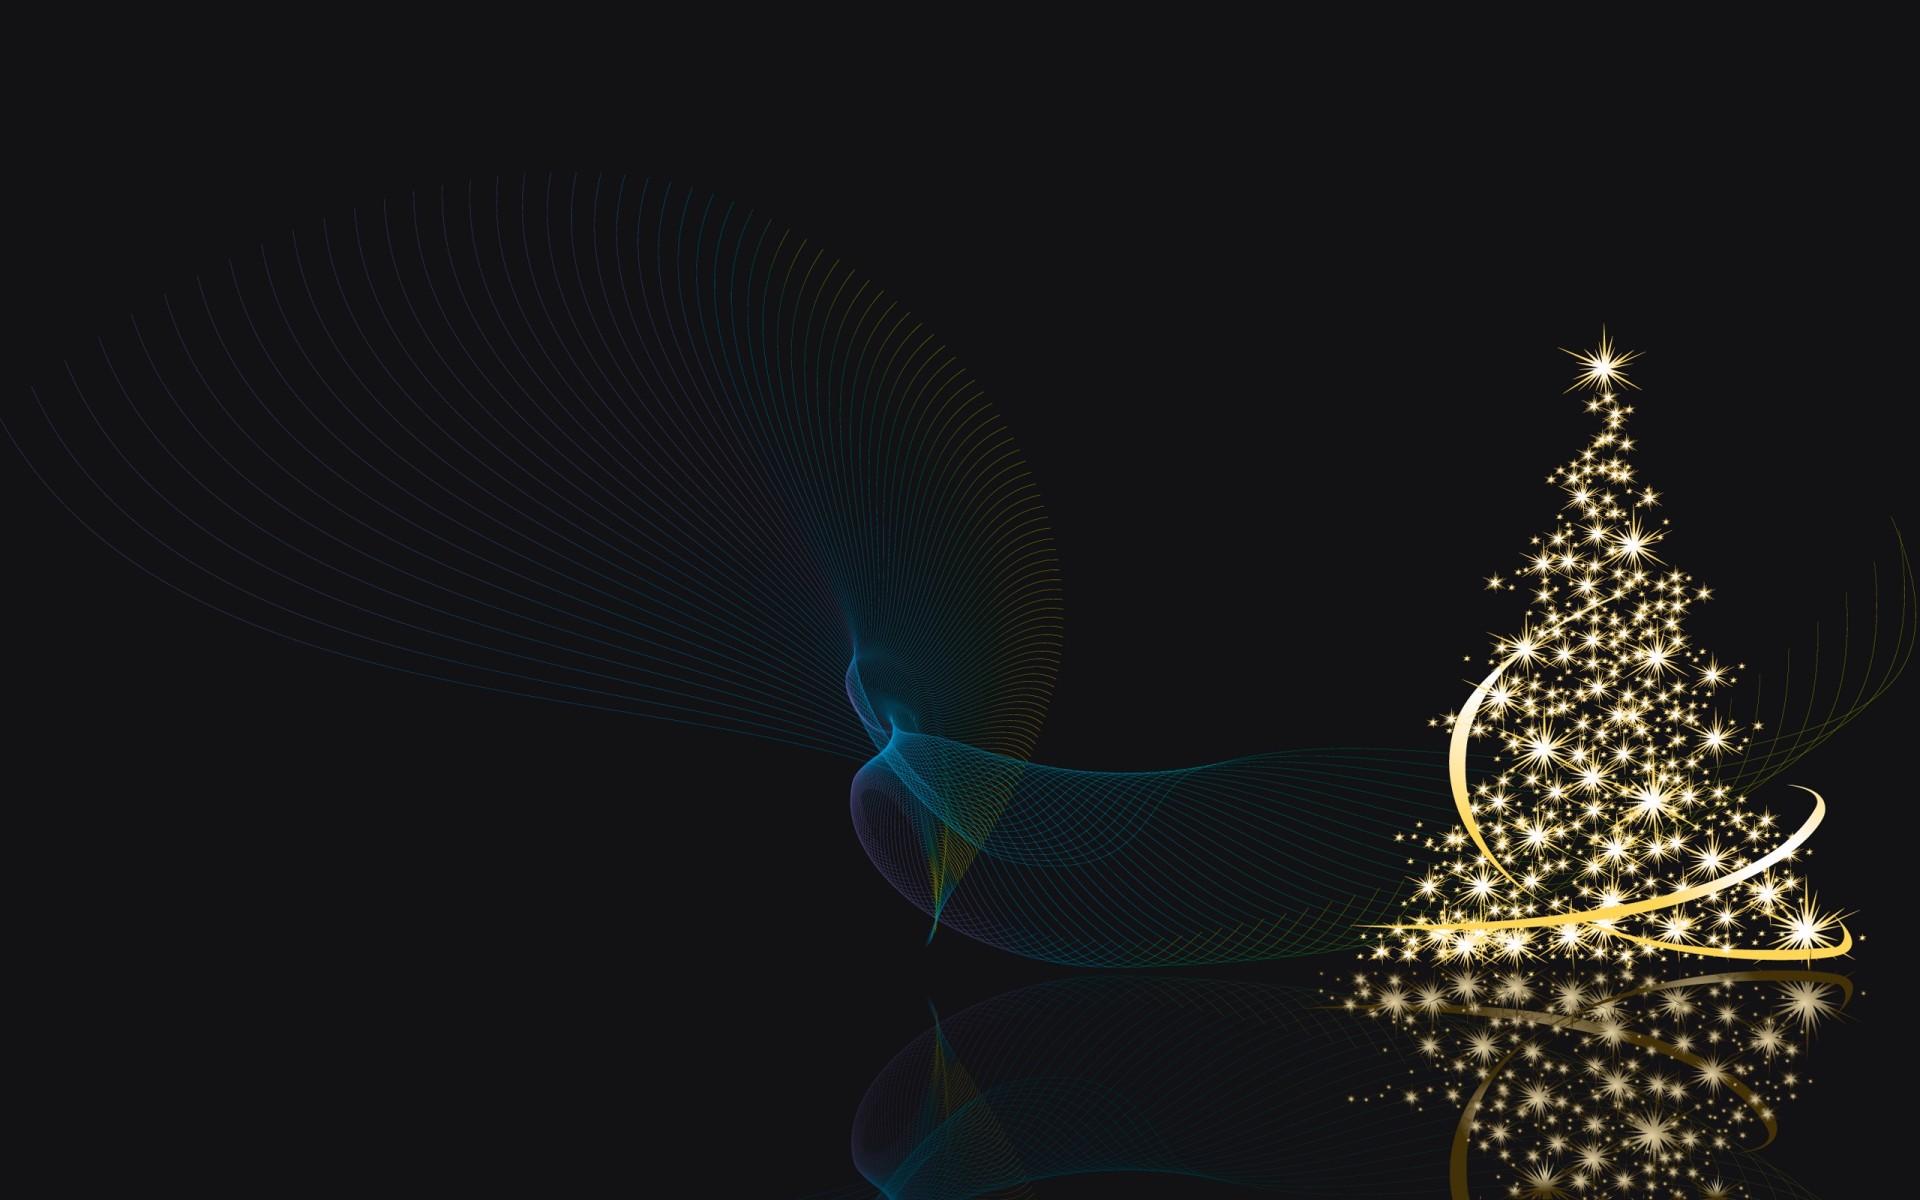 christmas tree on wall with lights photo - 4